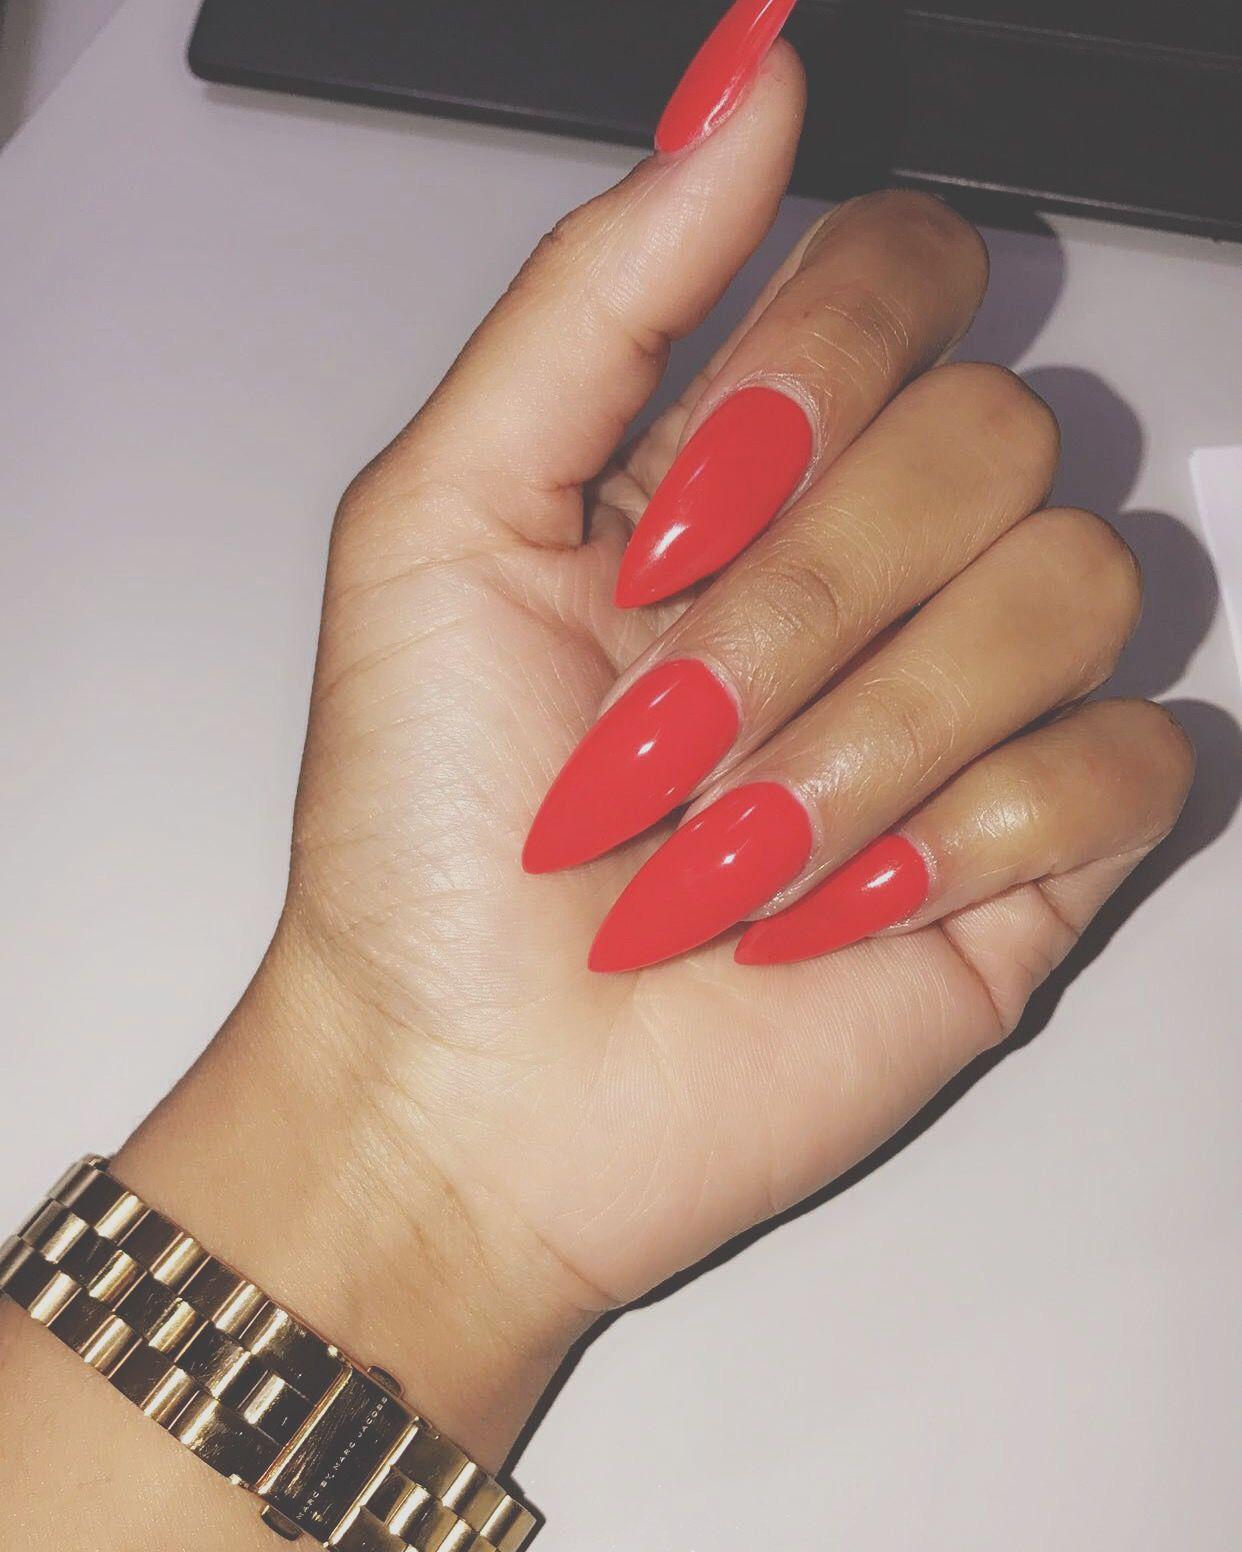 Funky Stiletto Nails Red Motif - Nail Art Ideas - morihati.com